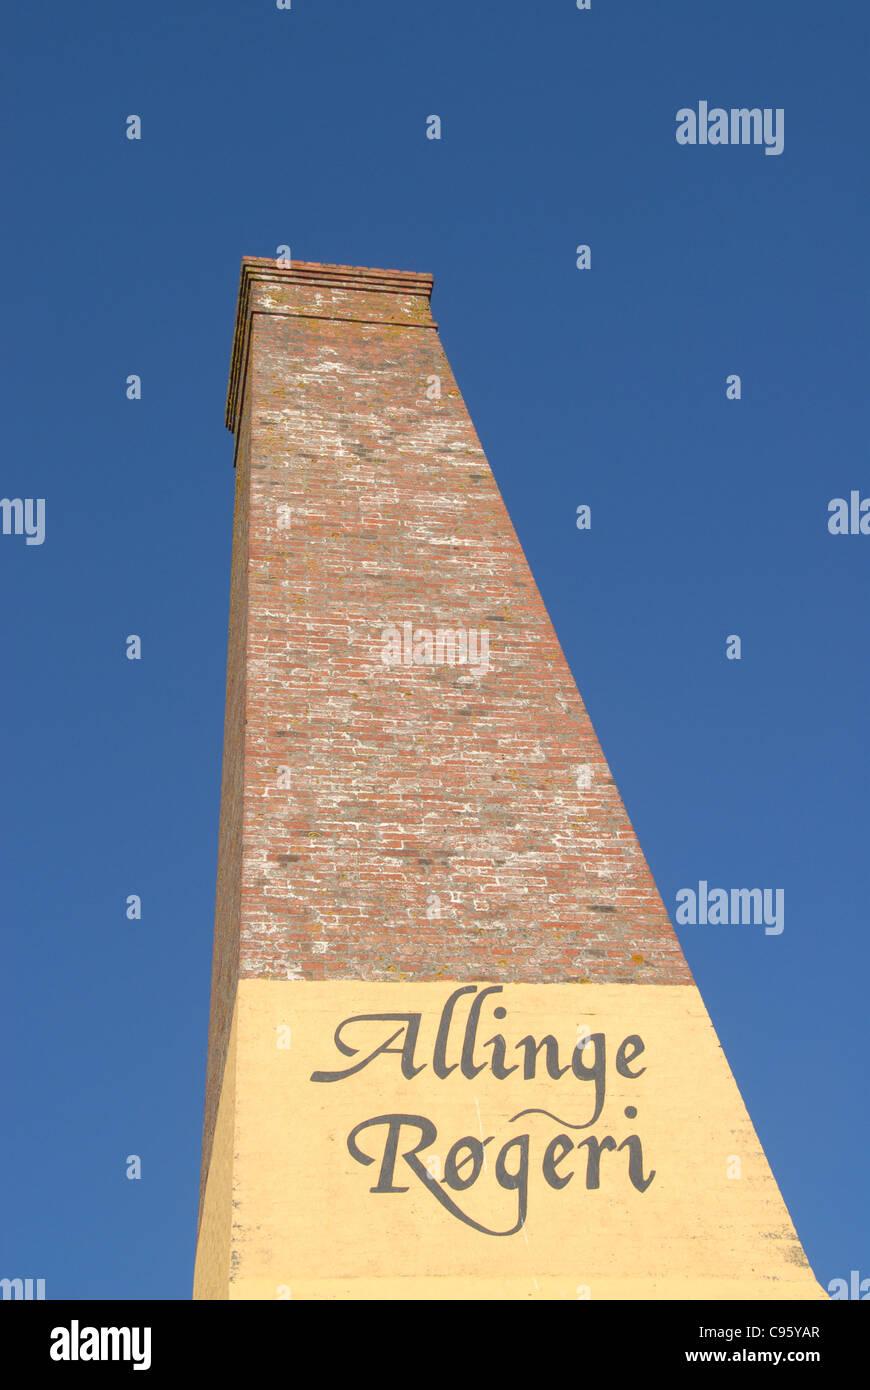 The smoke house, danish Røgeri, of Allinge on the Baltic Sea island of Bornholm Stock Photo